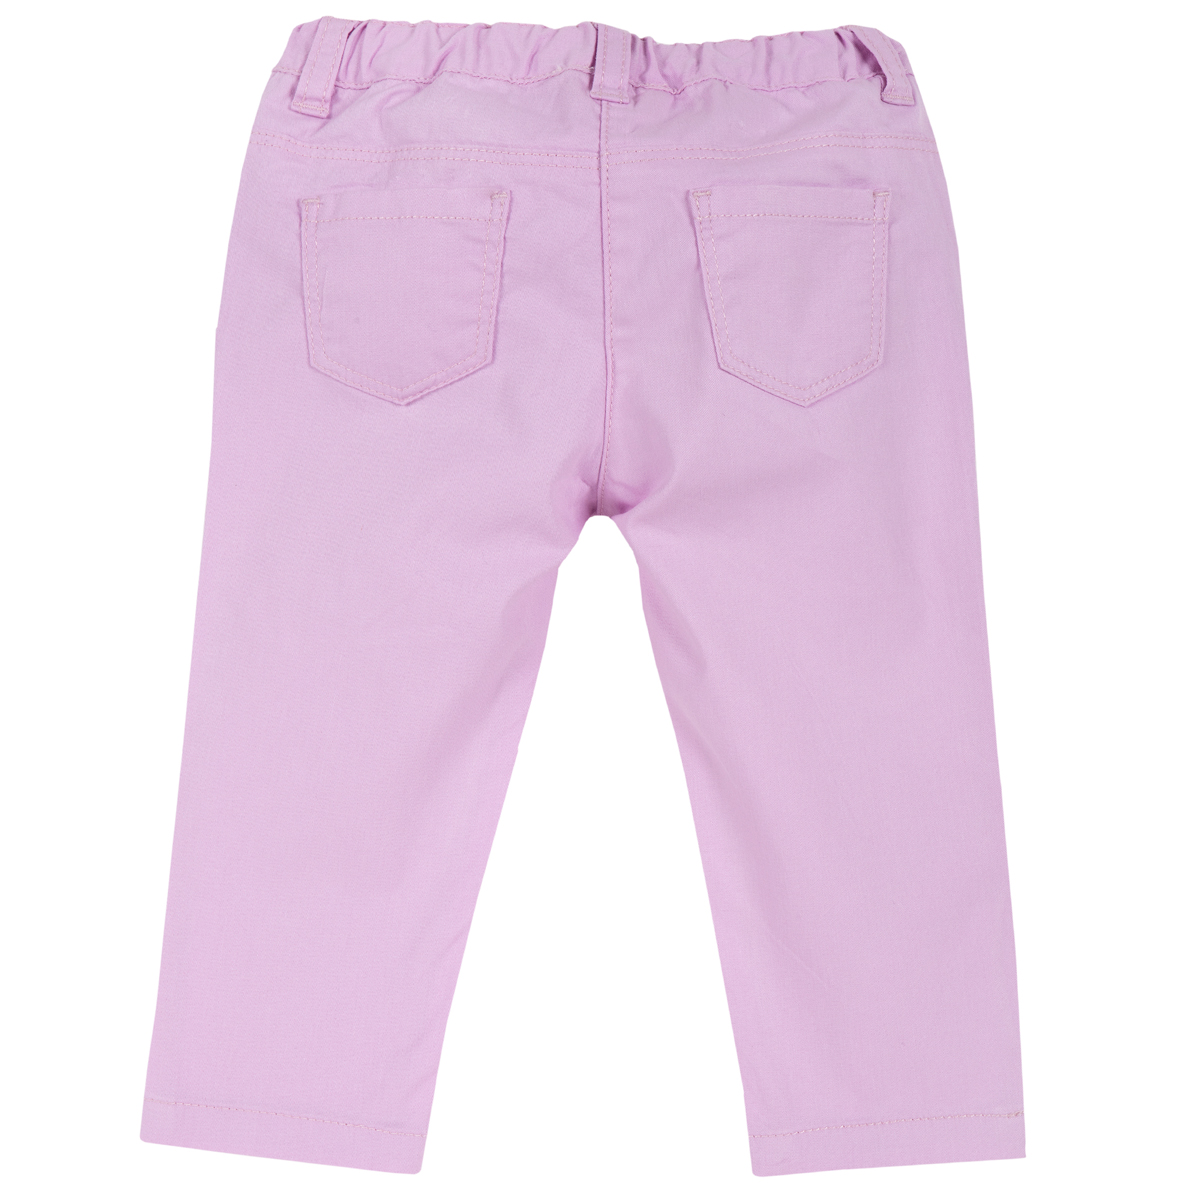 Pantalon lung copii Chicco, lila, 24910 din categoria Pantaloni copii